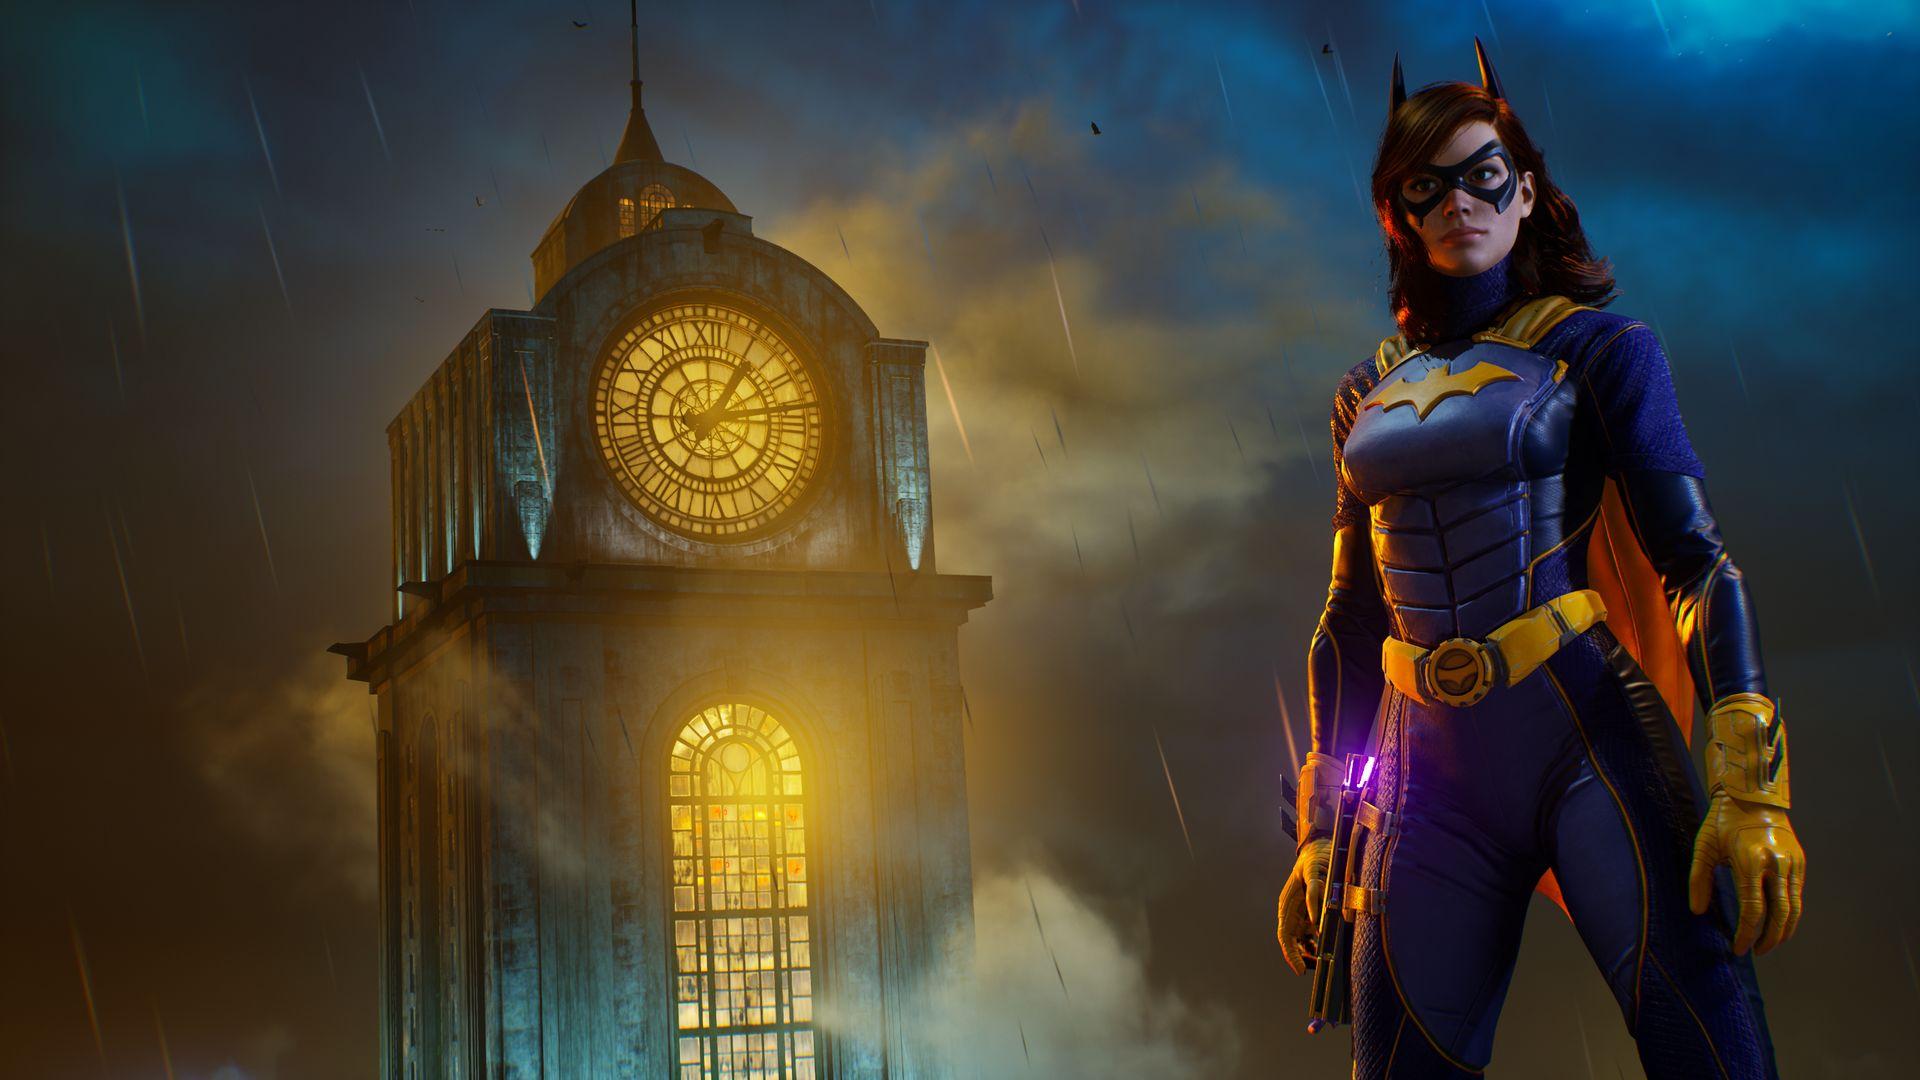 Gotham Knights anteprima la Corte dei Gufi